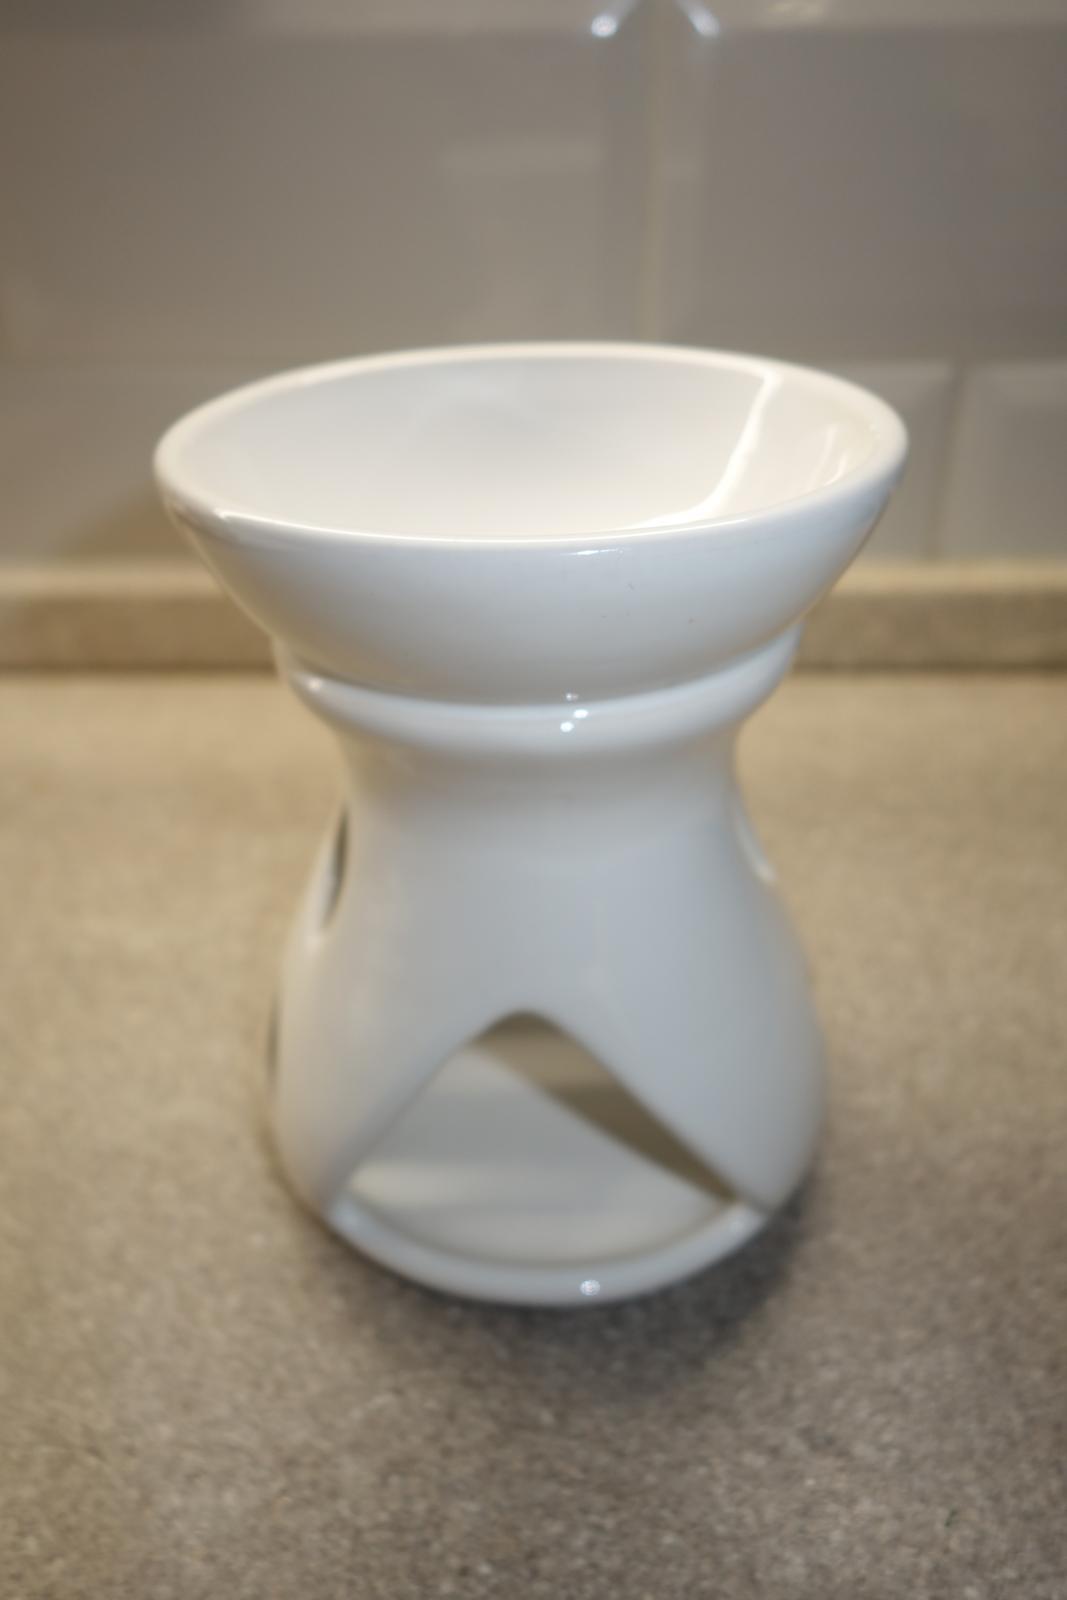 Biela aromalampa - Obrázok č. 1